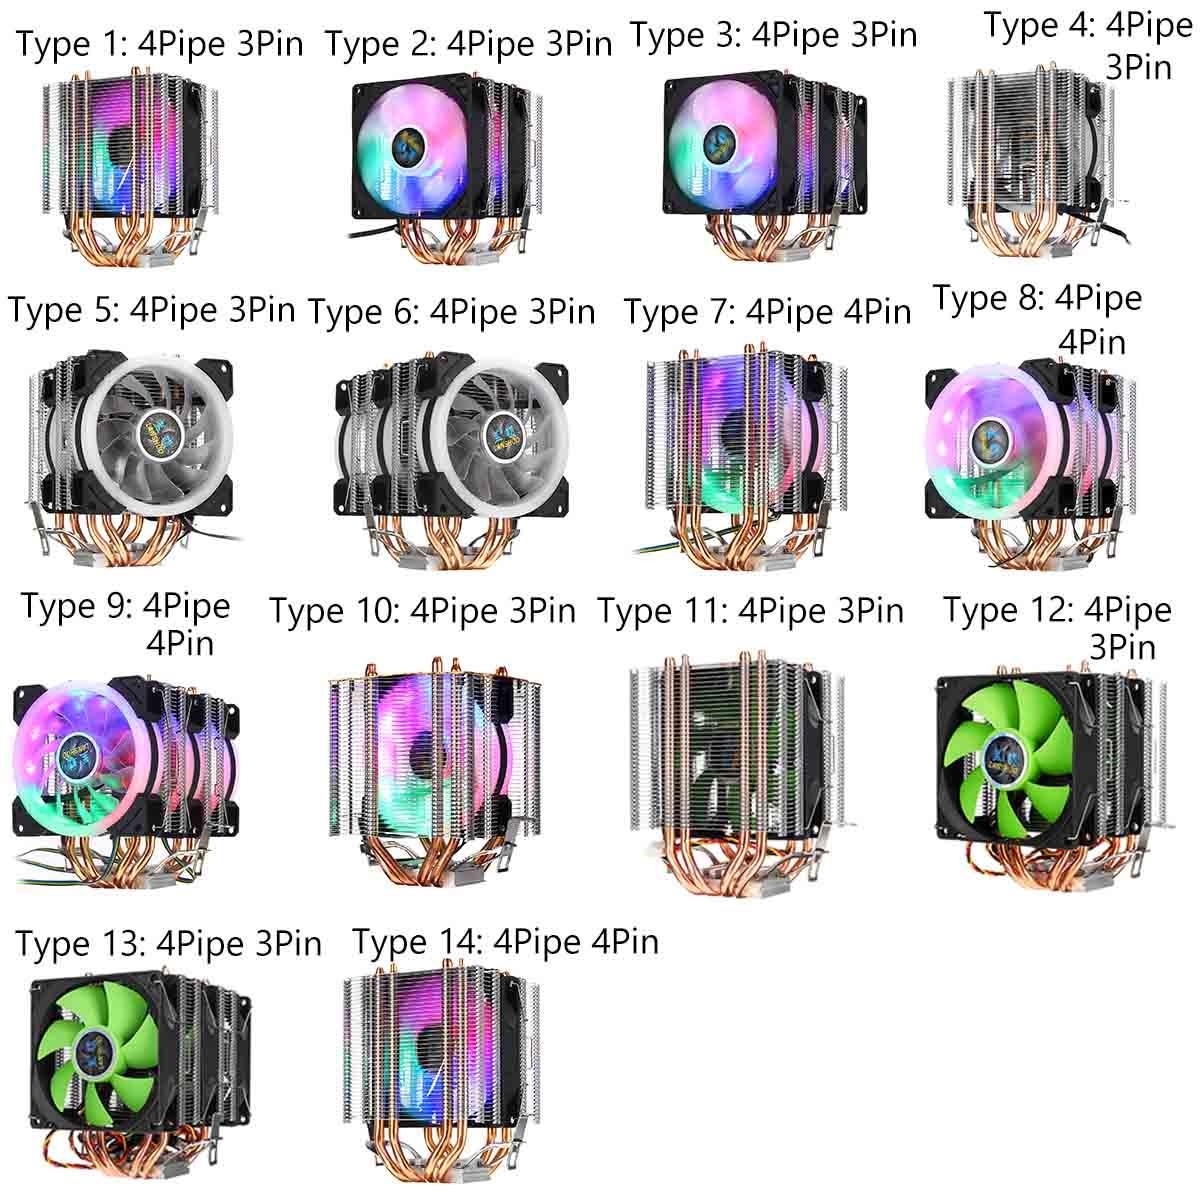 3pin/4pin Dual Tower CPU Cooler Fan 4 Heatpipe Cooler Cooling Fan Quiet Fan For Intel 775/1150/1151/1155/1156/1366 For AMD